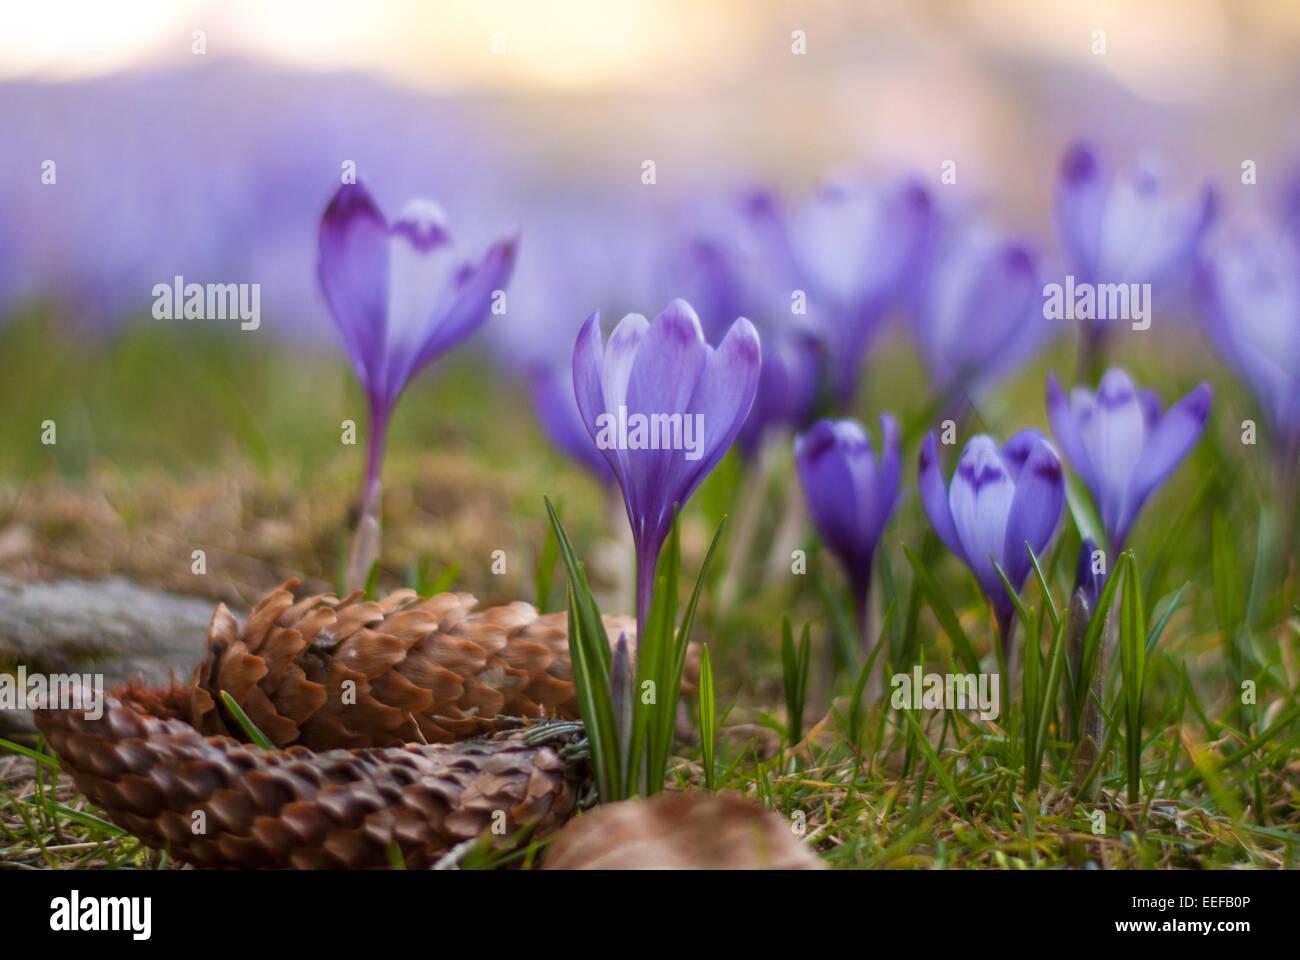 Purple crocus field. Blue crocuses. A field filled of violet (purple, blue, magenta) crocuses. - Stock Image